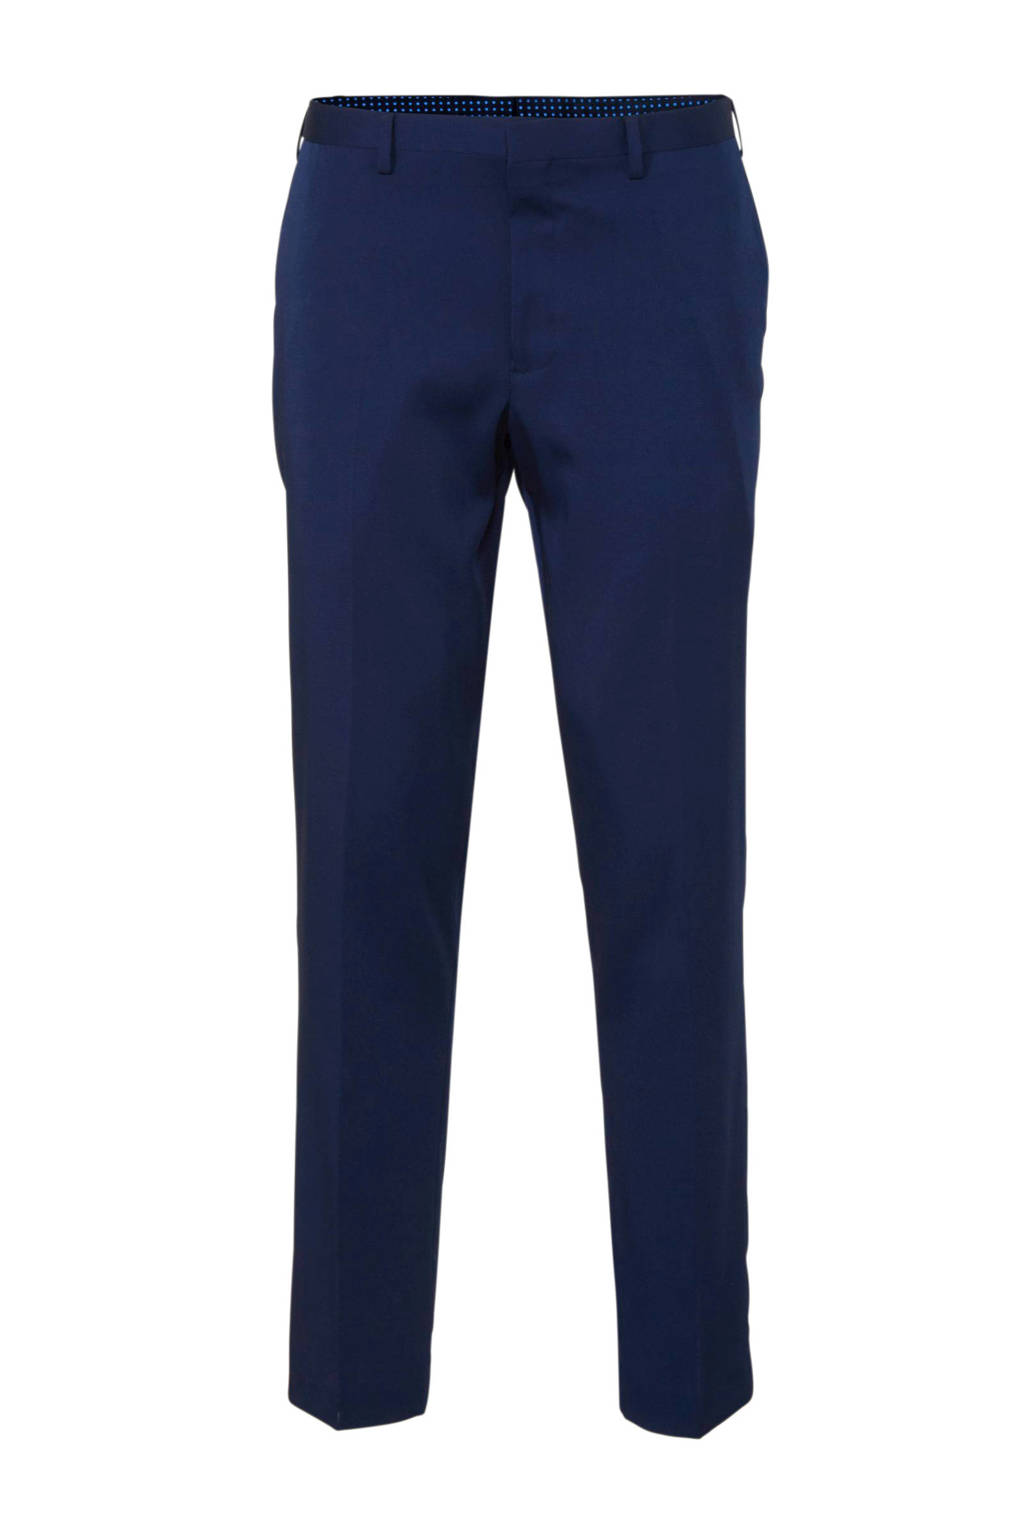 C&A Angelo Litrico regular fit pantalon donkerblauw, Donkerblauw